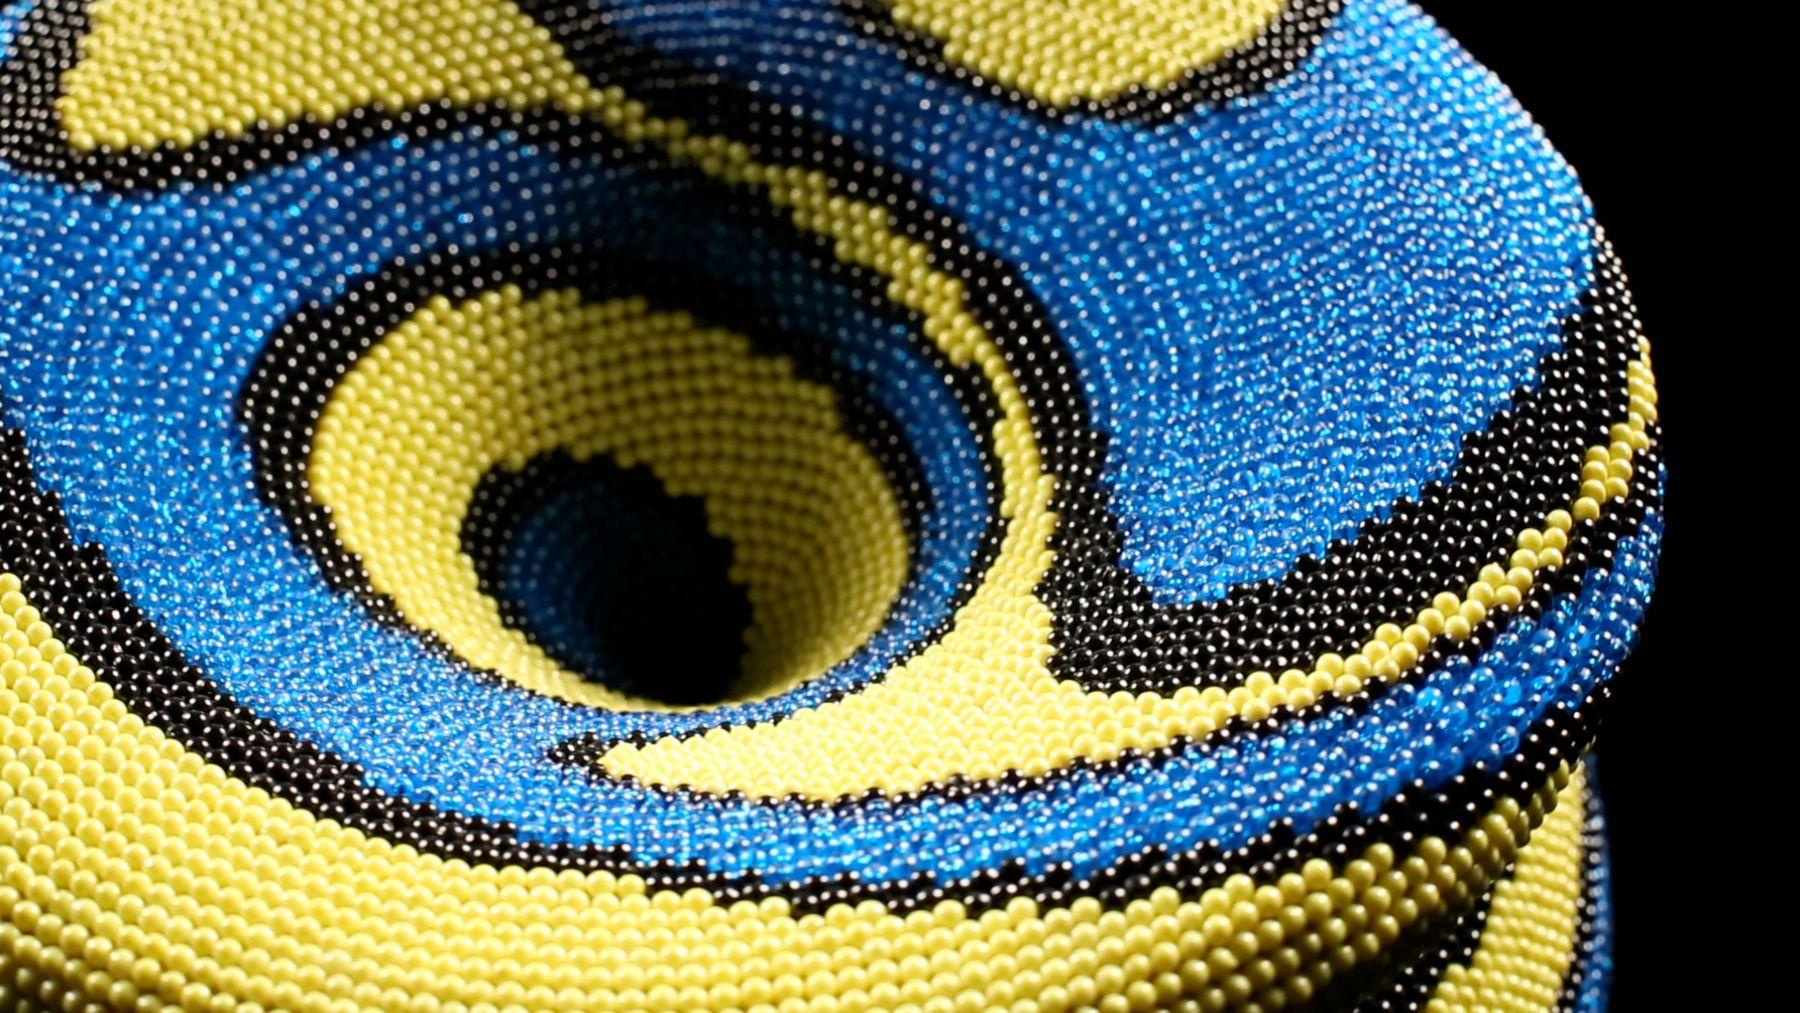 david mach, Yellow Drift (detail), 2012, plastic ball pins on foam 23 1/4 x 13 1/2 x 13 1/2 inches